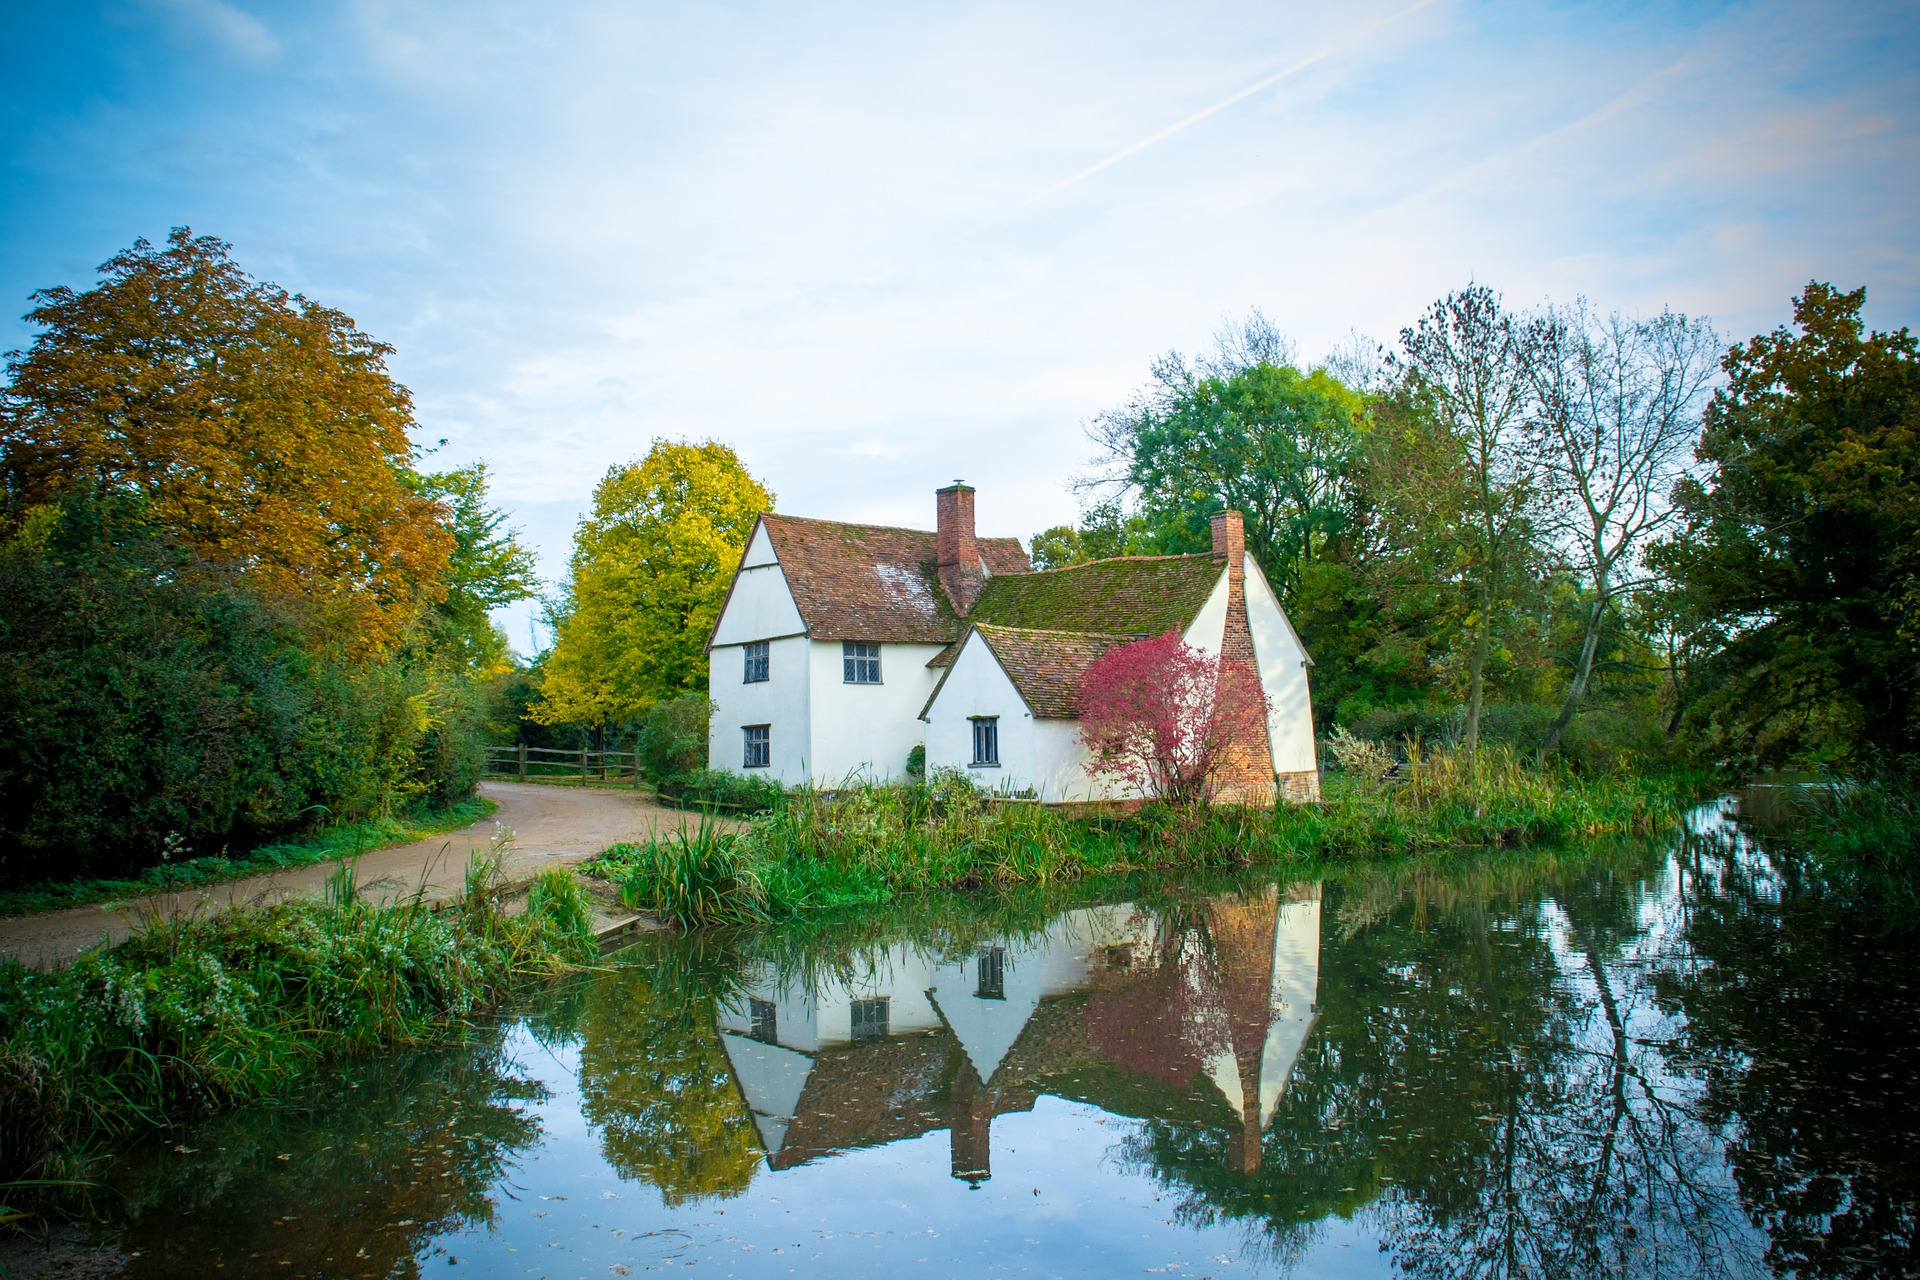 cottage-1300803_1920.jpg